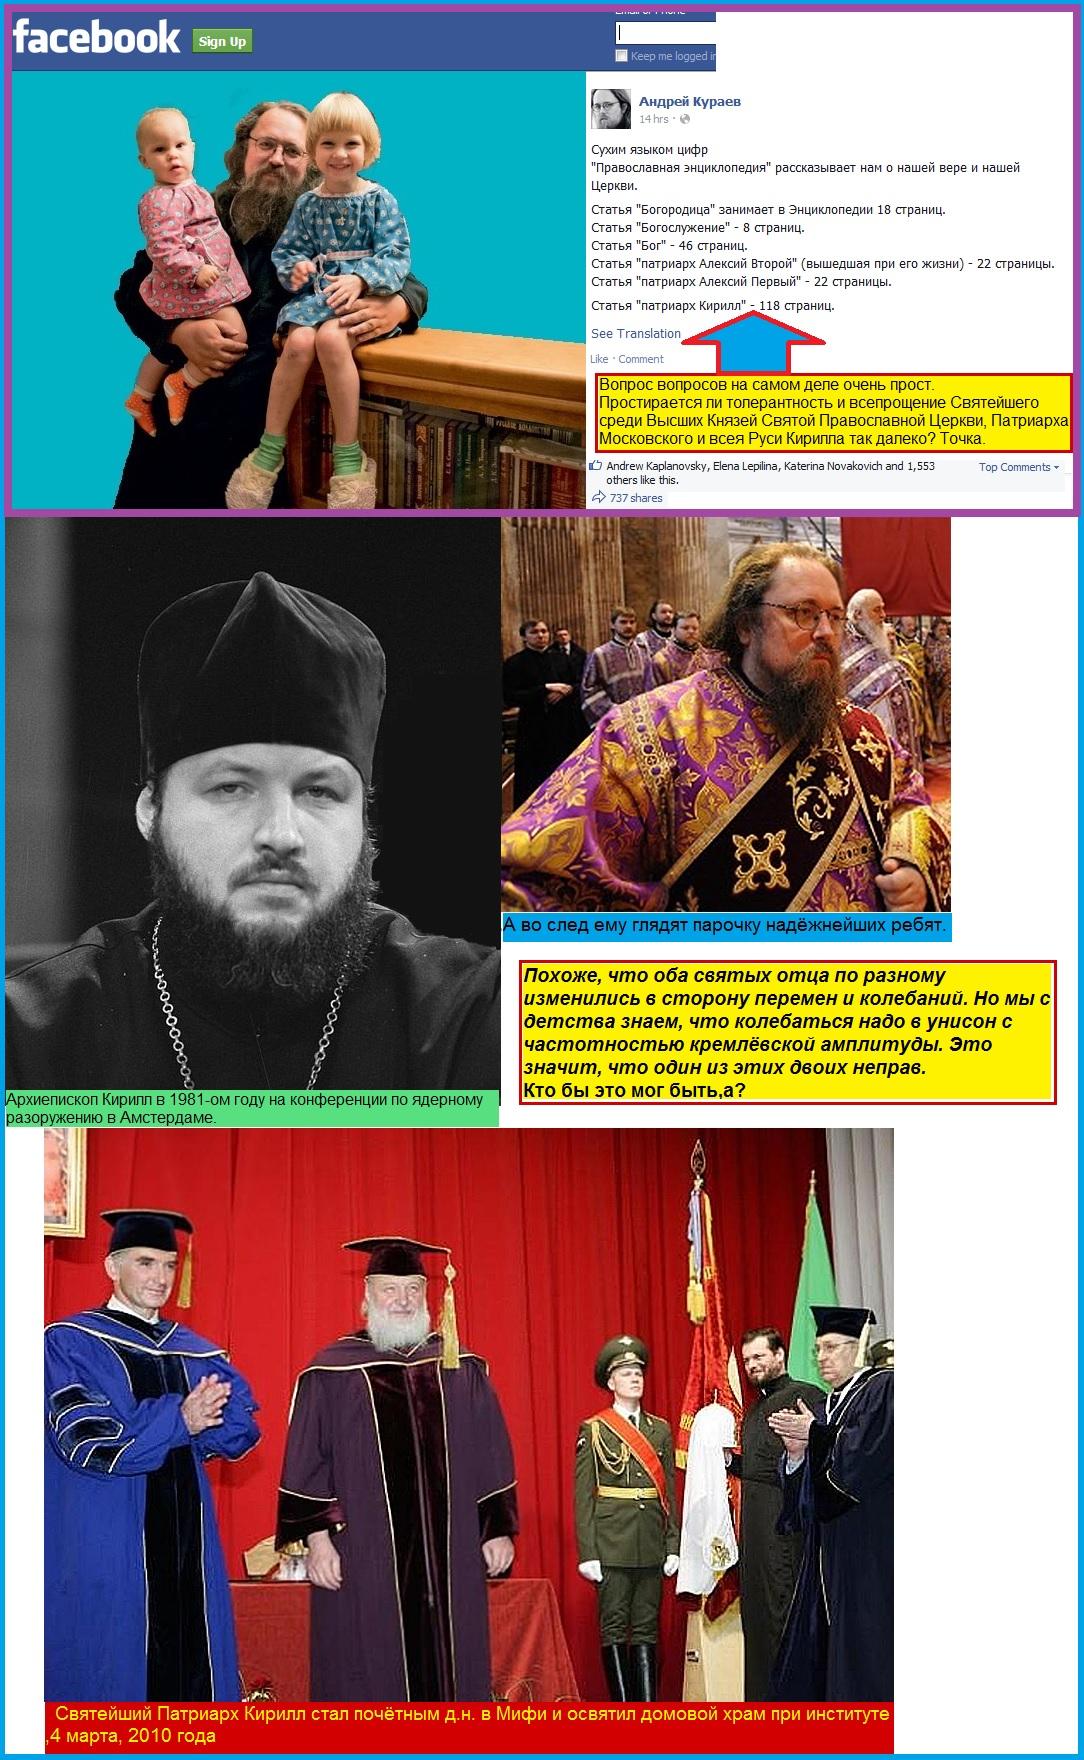 Святейший Патриарх Кирилл и Протодиакон Андрей (Кураев)